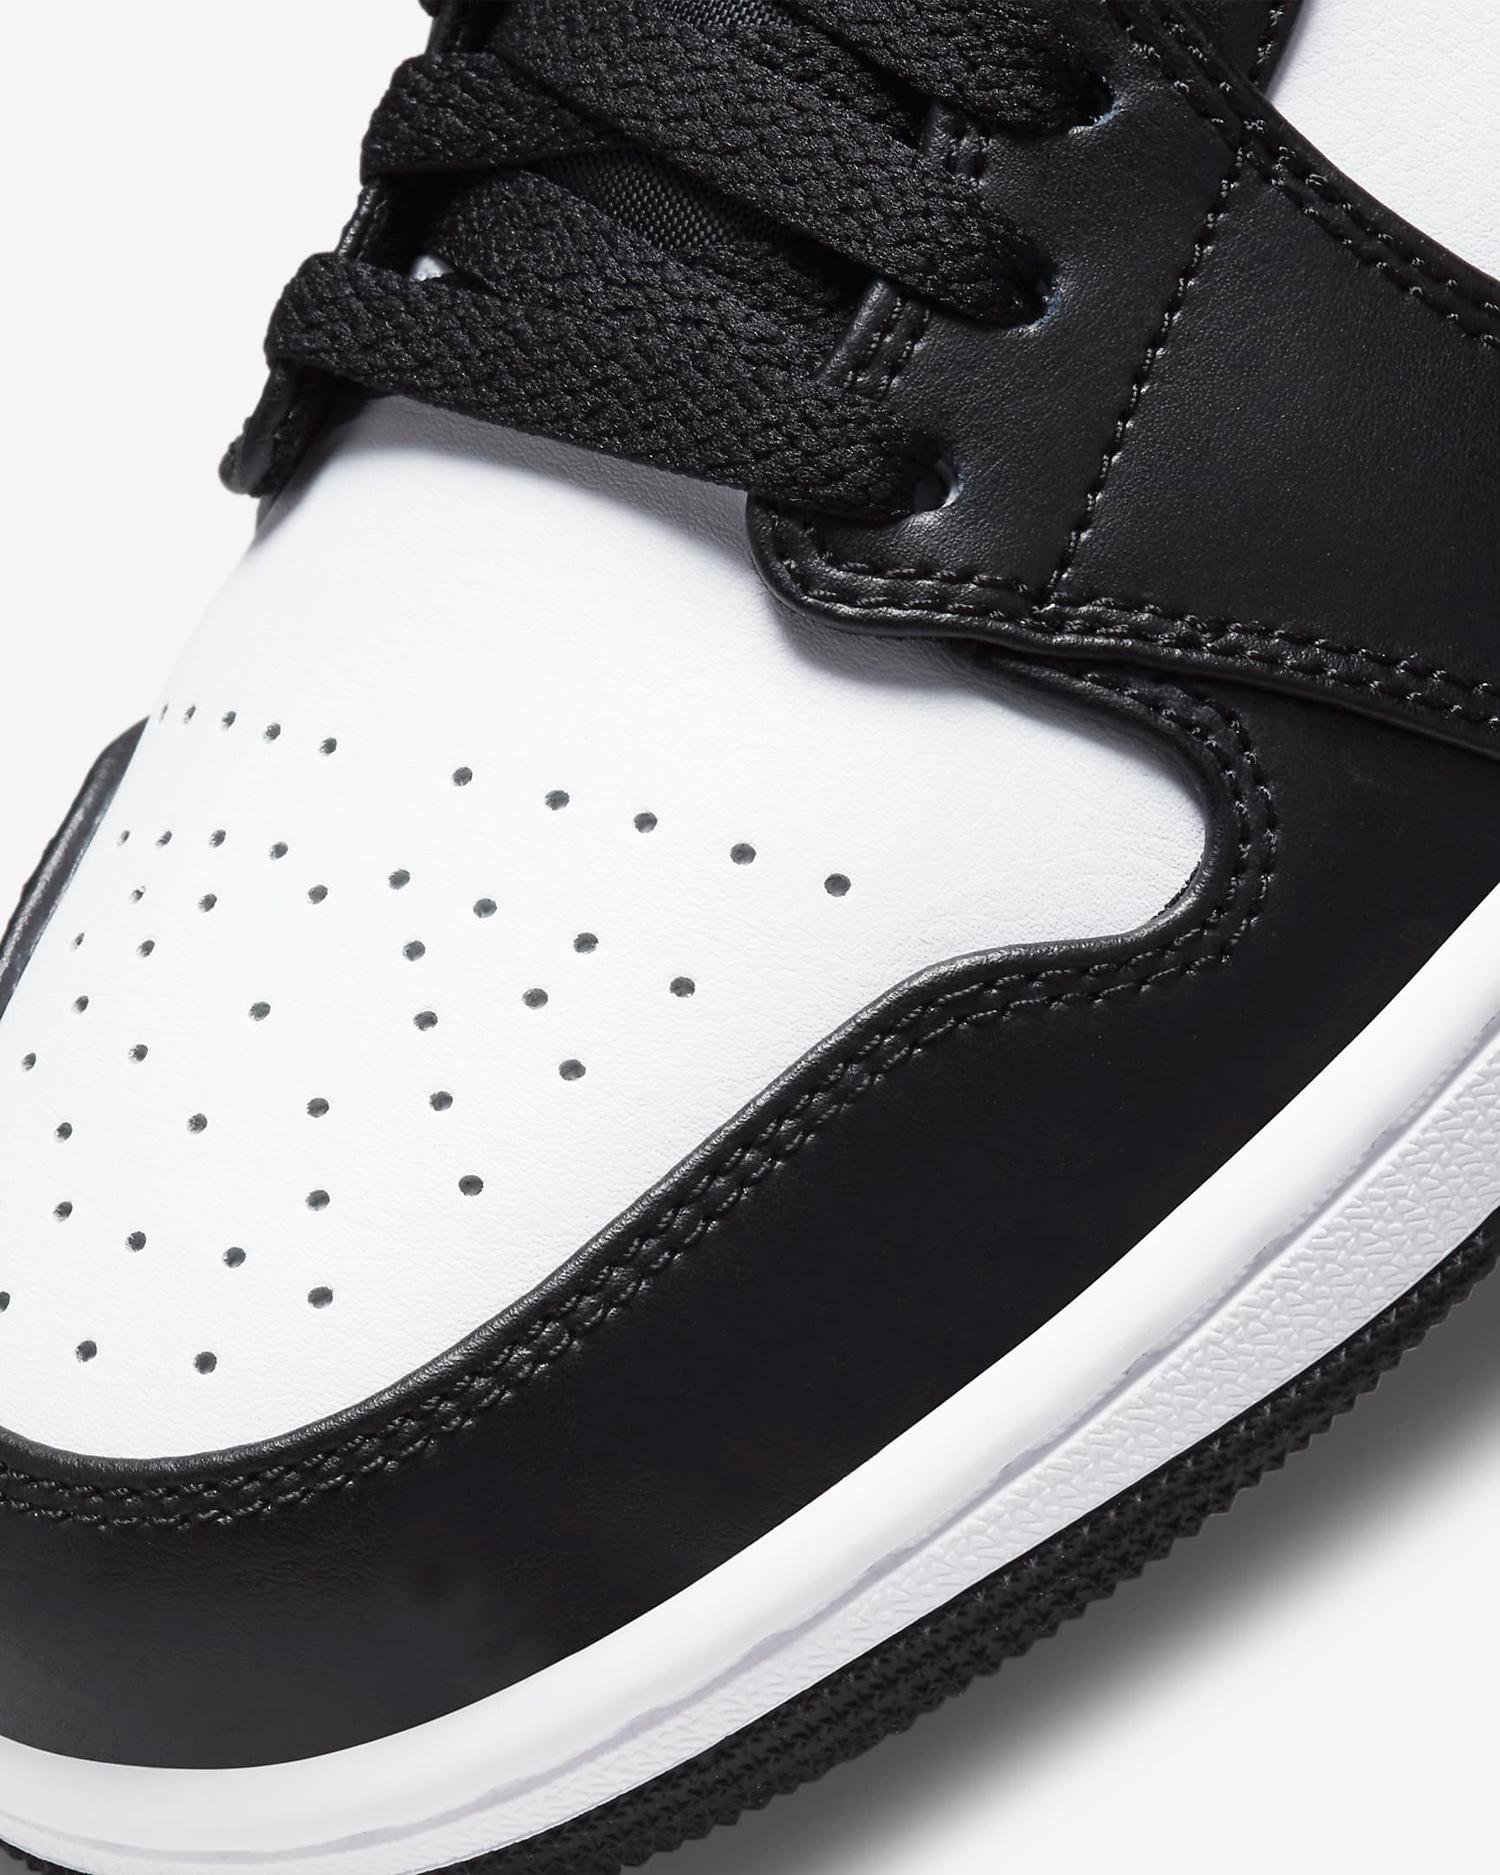 air-jordan-1-low-shadow-black-white-particle-grey-7